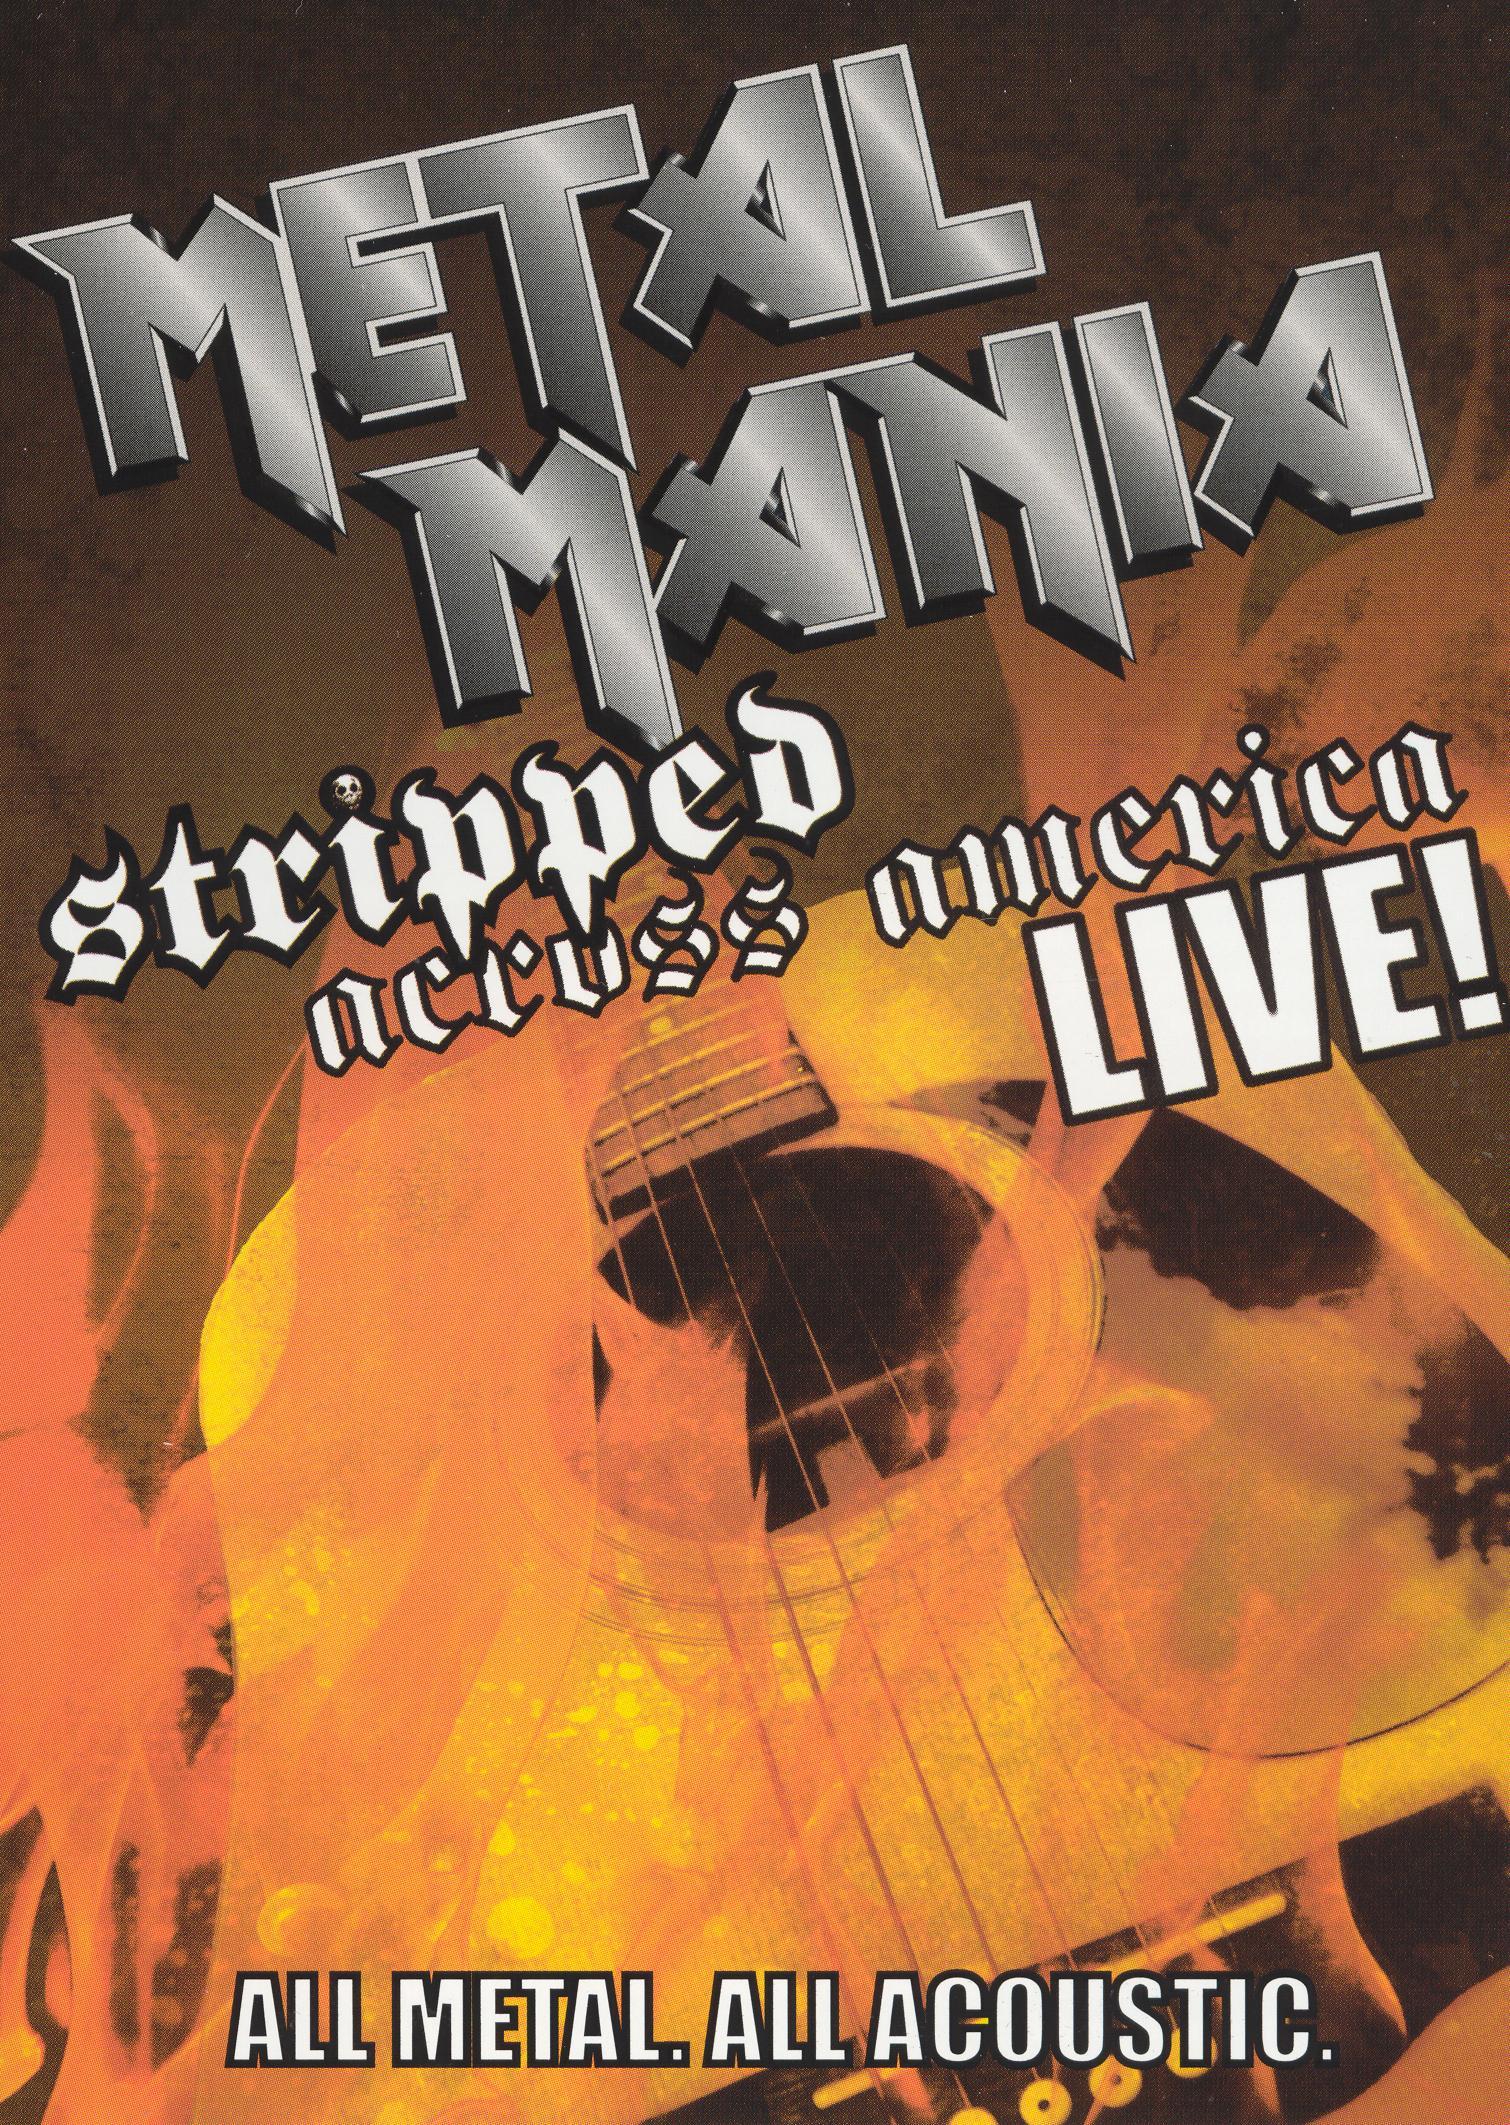 VH1 Metal Mania: Stripped Across America Tour Live